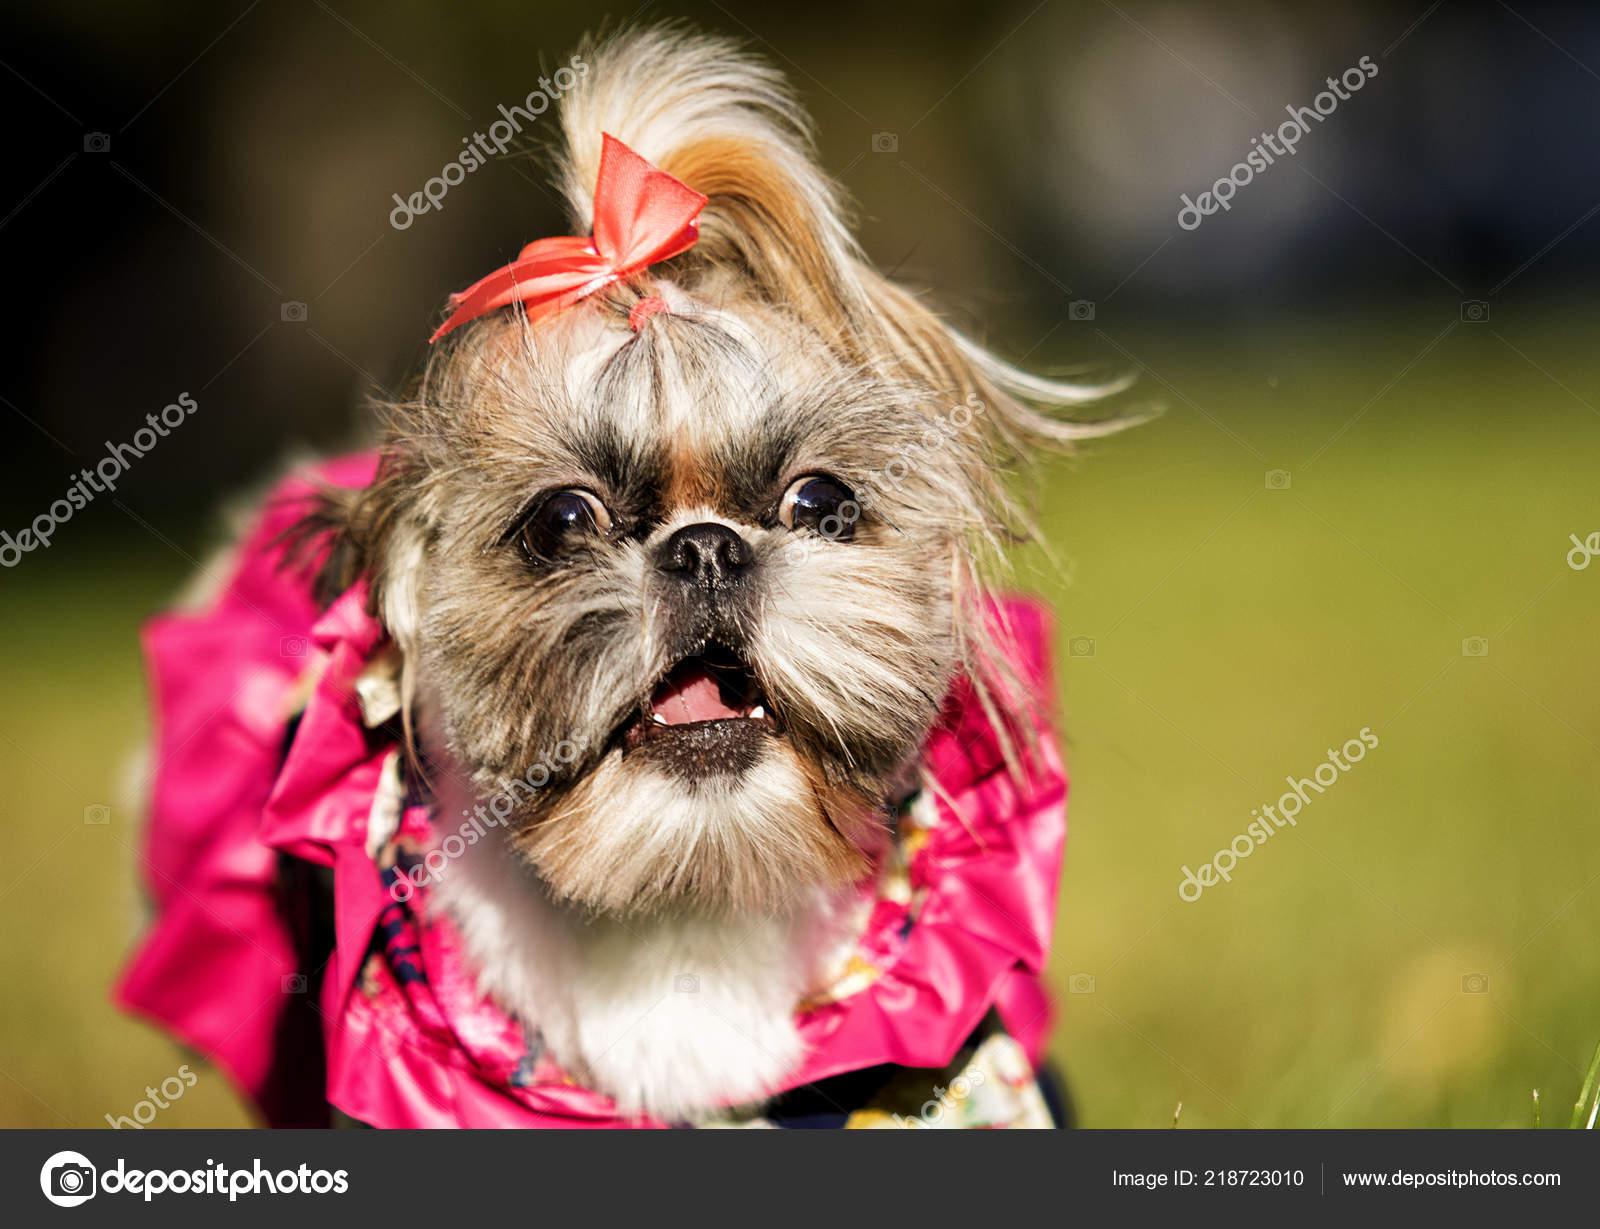 Shih Tzu Dog Runs Clothes Stock Photo C Gurinaleksandr 218723010